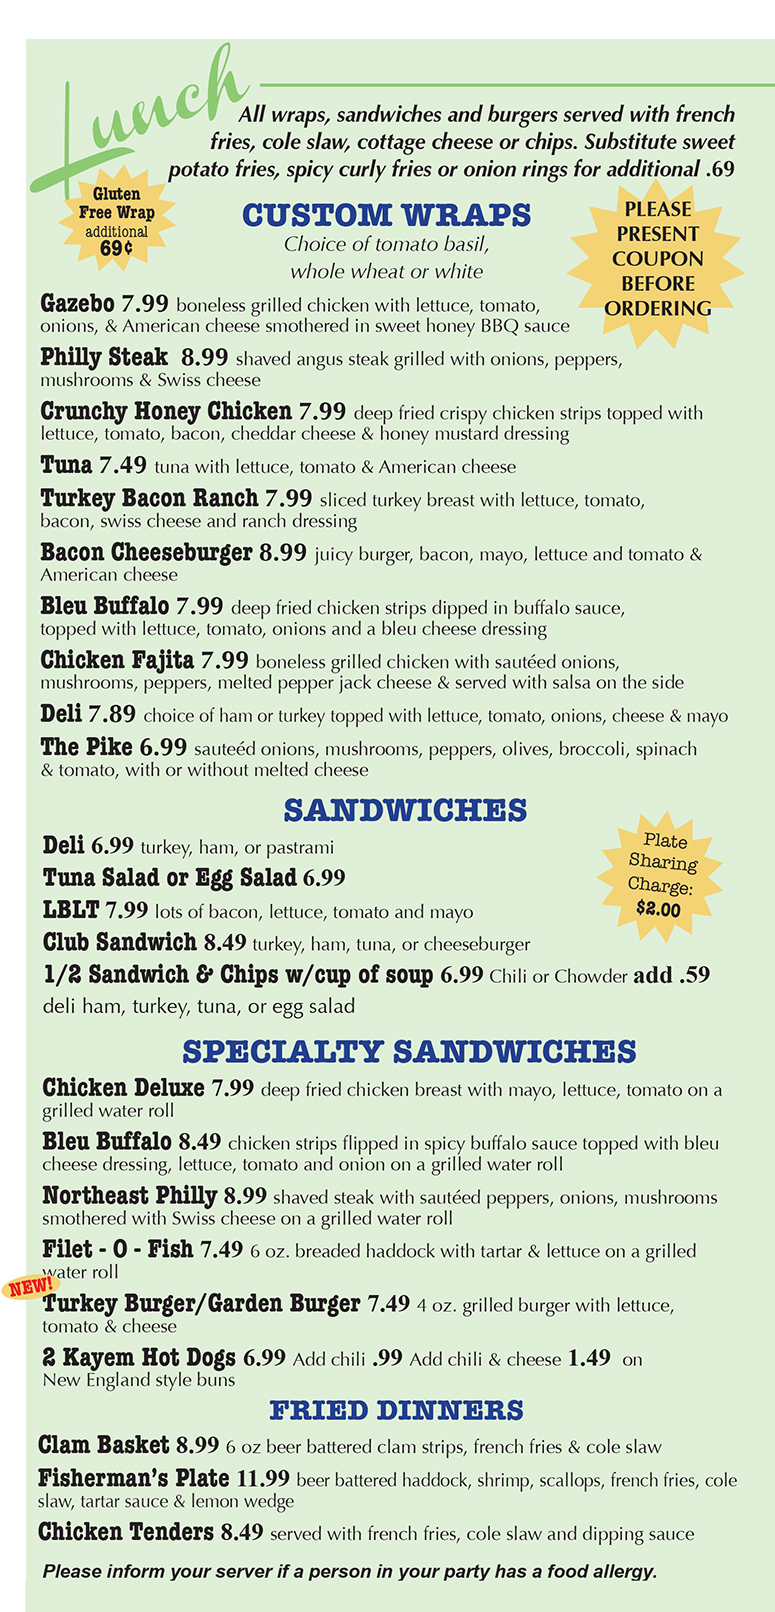 GoodTable menu 16-0257-1-775pxwide